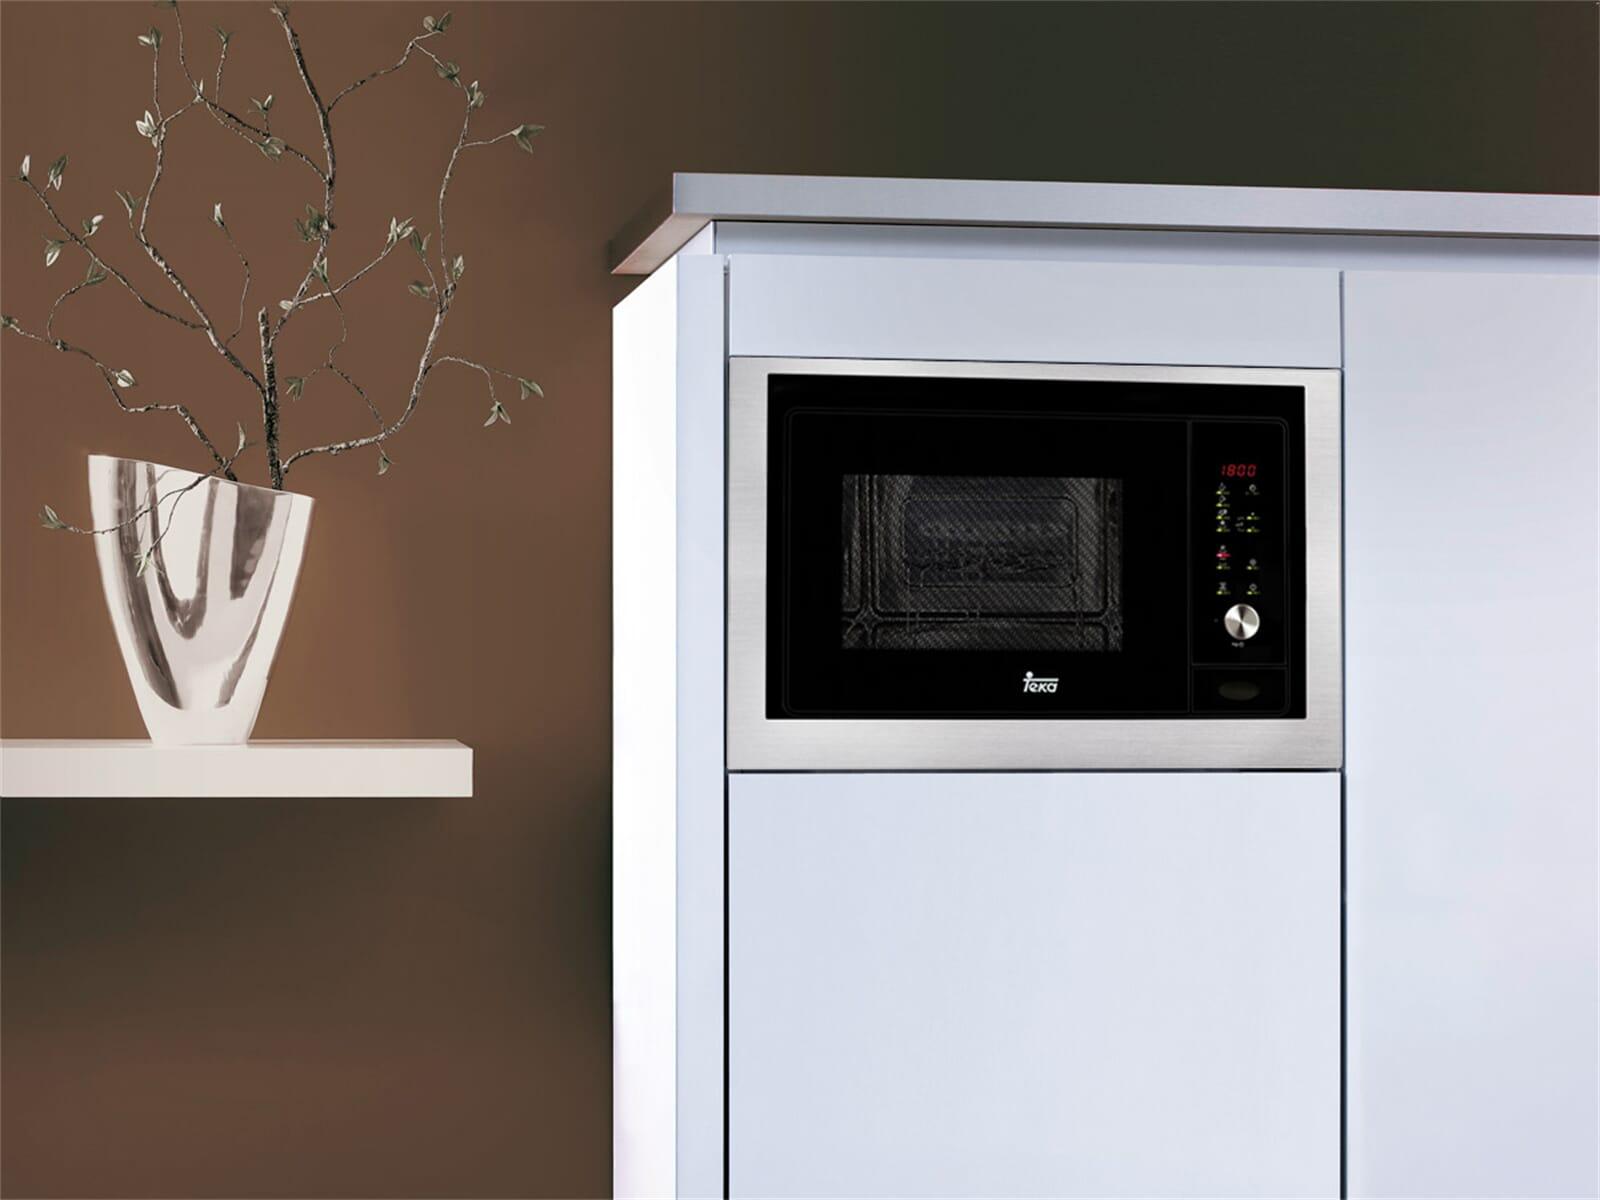 teka mwl 20 bis einbau mikrowelle mit grill edelstahl. Black Bedroom Furniture Sets. Home Design Ideas